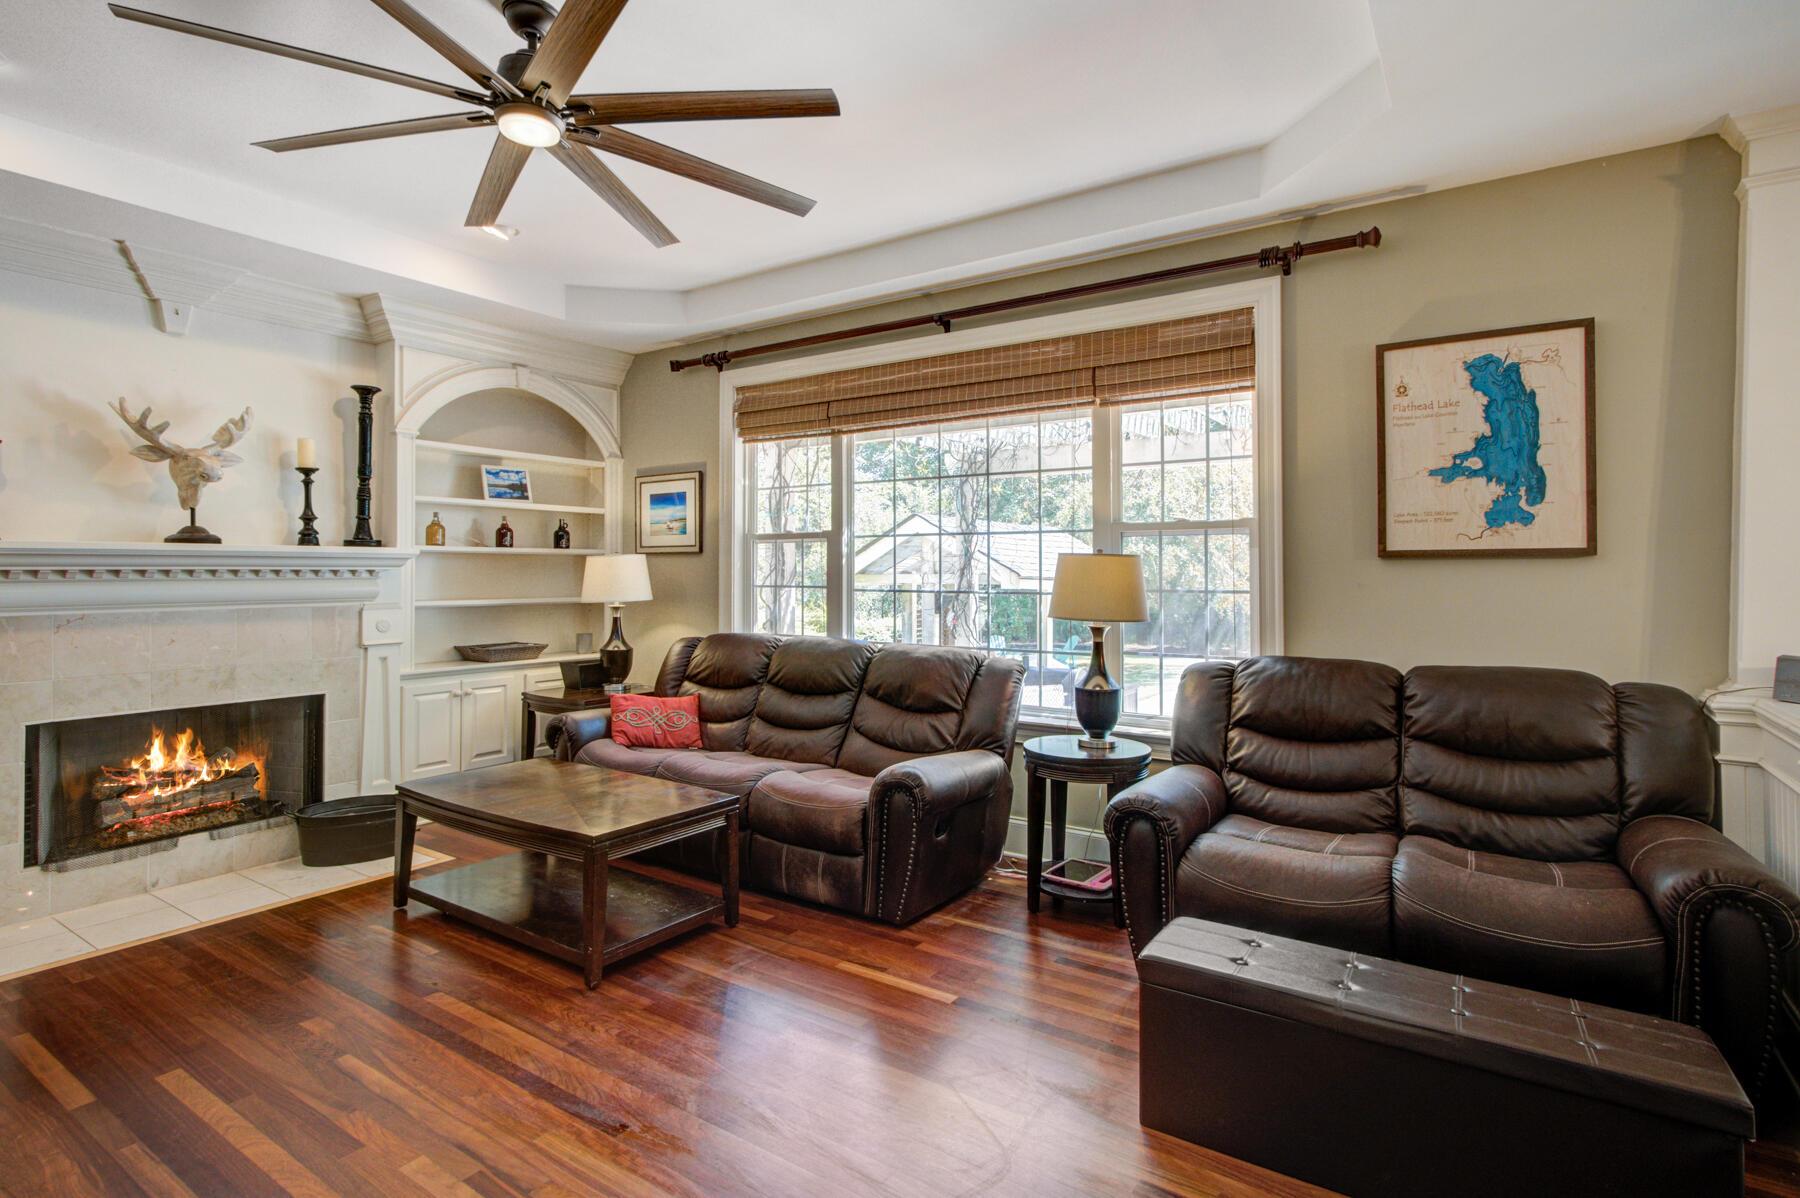 Dunes West Homes For Sale - 3095 Pignatelli, Mount Pleasant, SC - 11